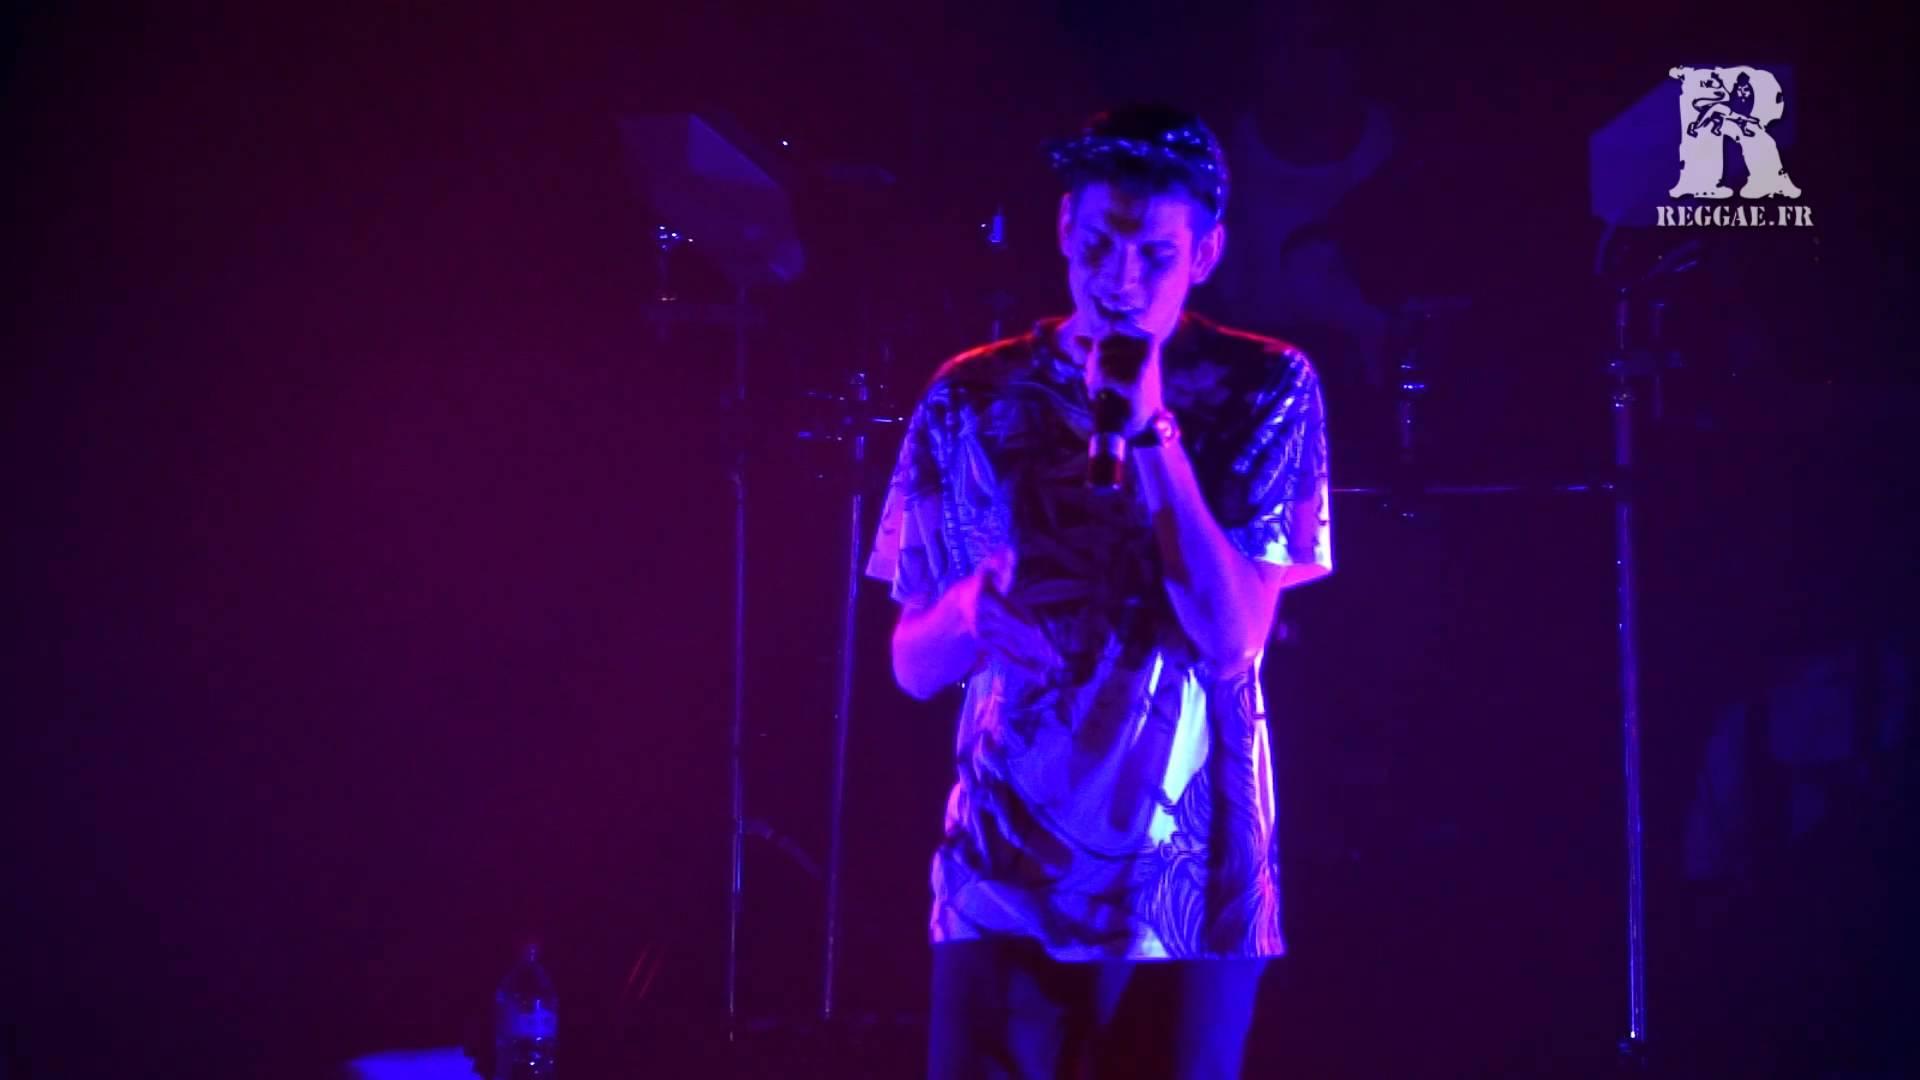 Biga Ranx - DJ for the Night in Laudun-l'Ardoise, France @ Zion Garden d'Hiver 2015 [3/7/2015]